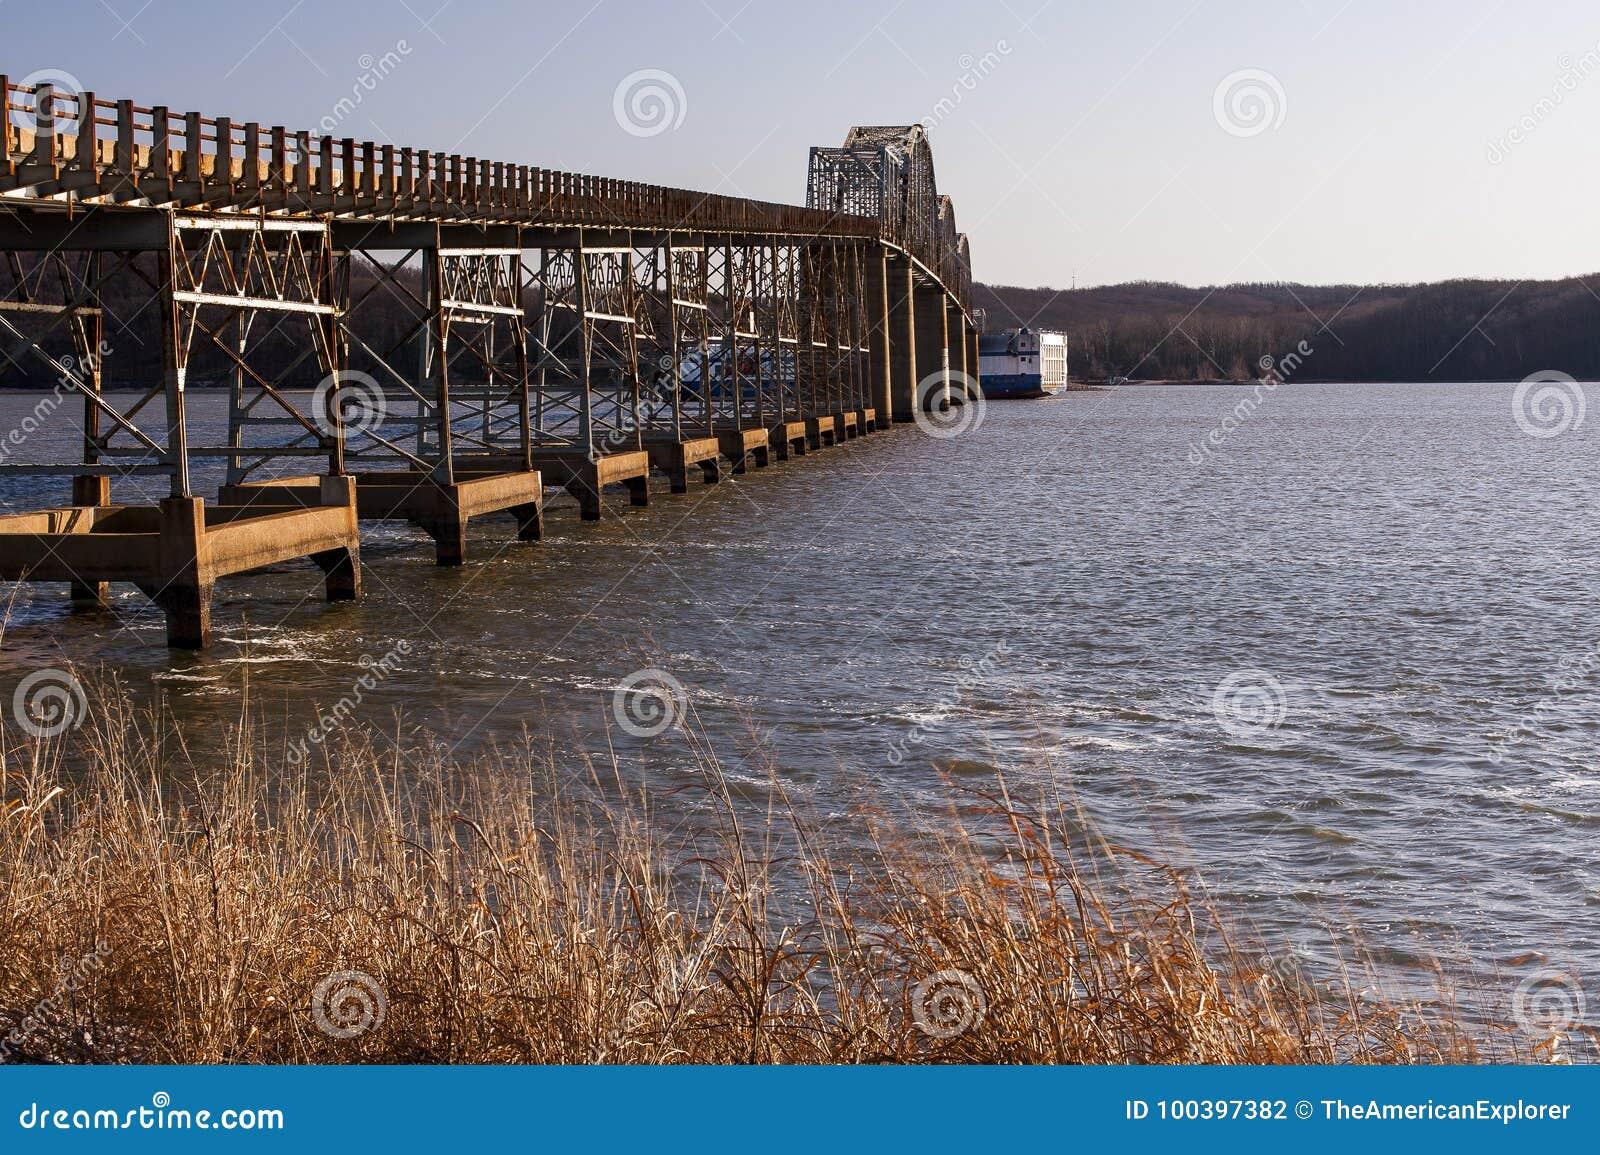 Eggner`s Ferry Bridge Collapse - Kentucky Lake, Kentucky